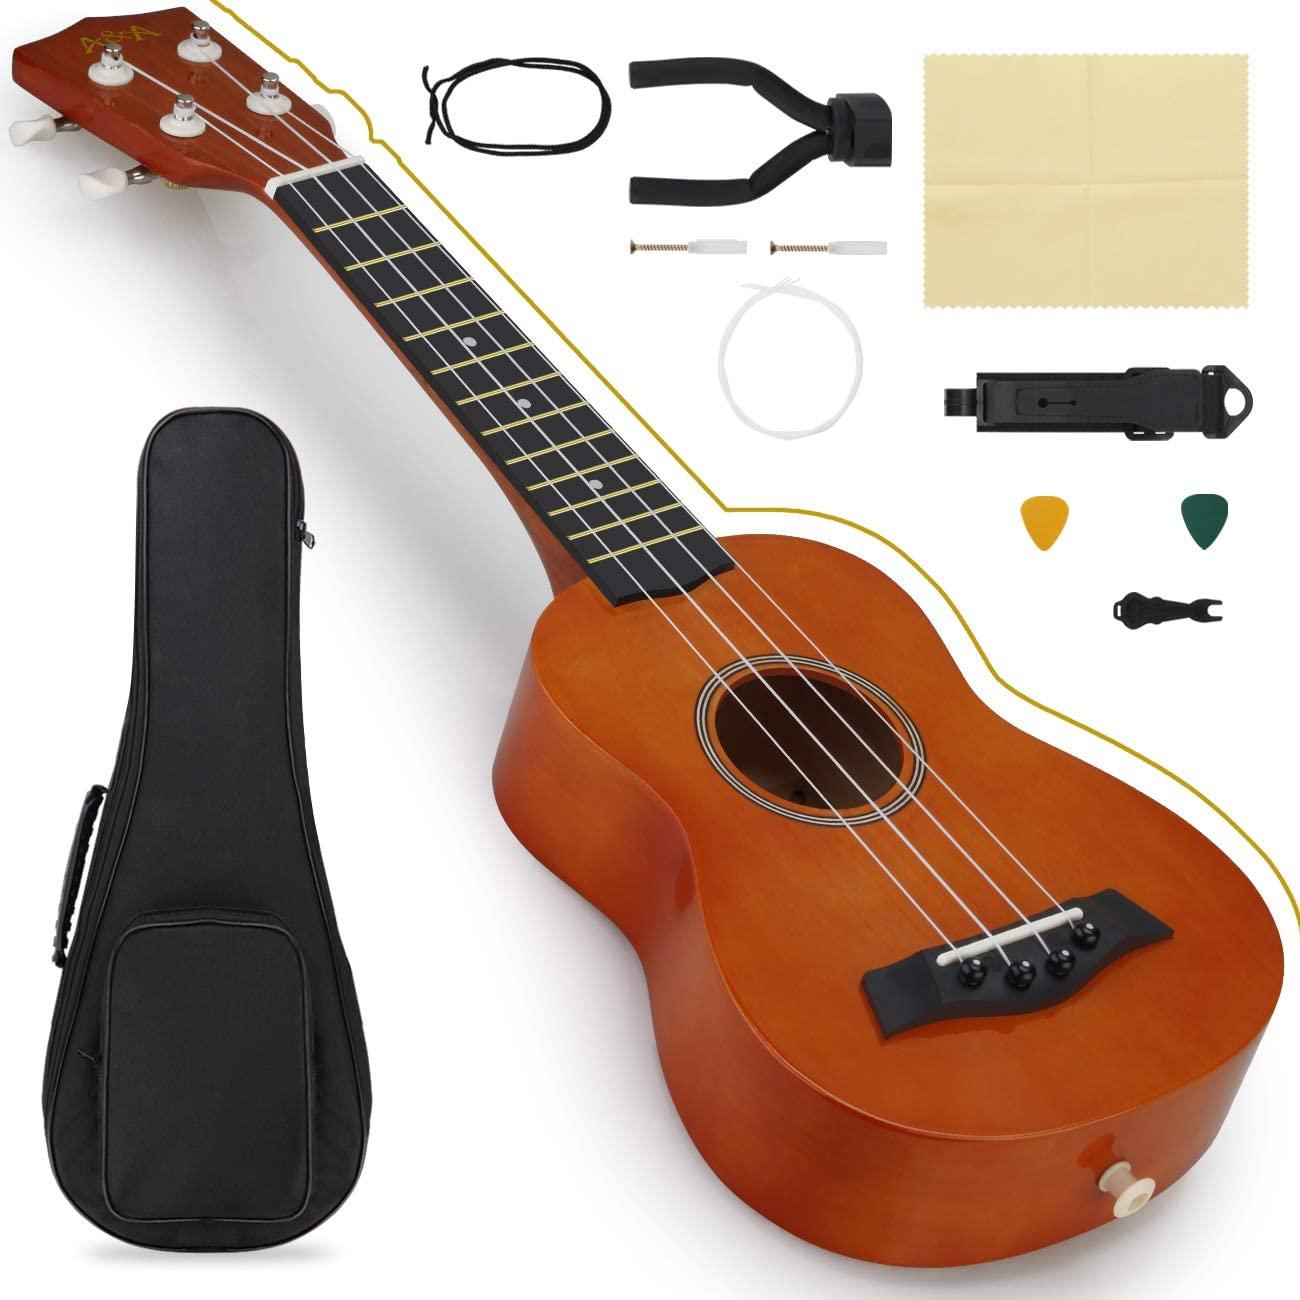 A&A Ukulele Soprano 21 inch Beginner Professional Wooden Ukelele Instrument Kit Bundle with Bag Strapr Picks Hanger and Polishing Cloth Orange